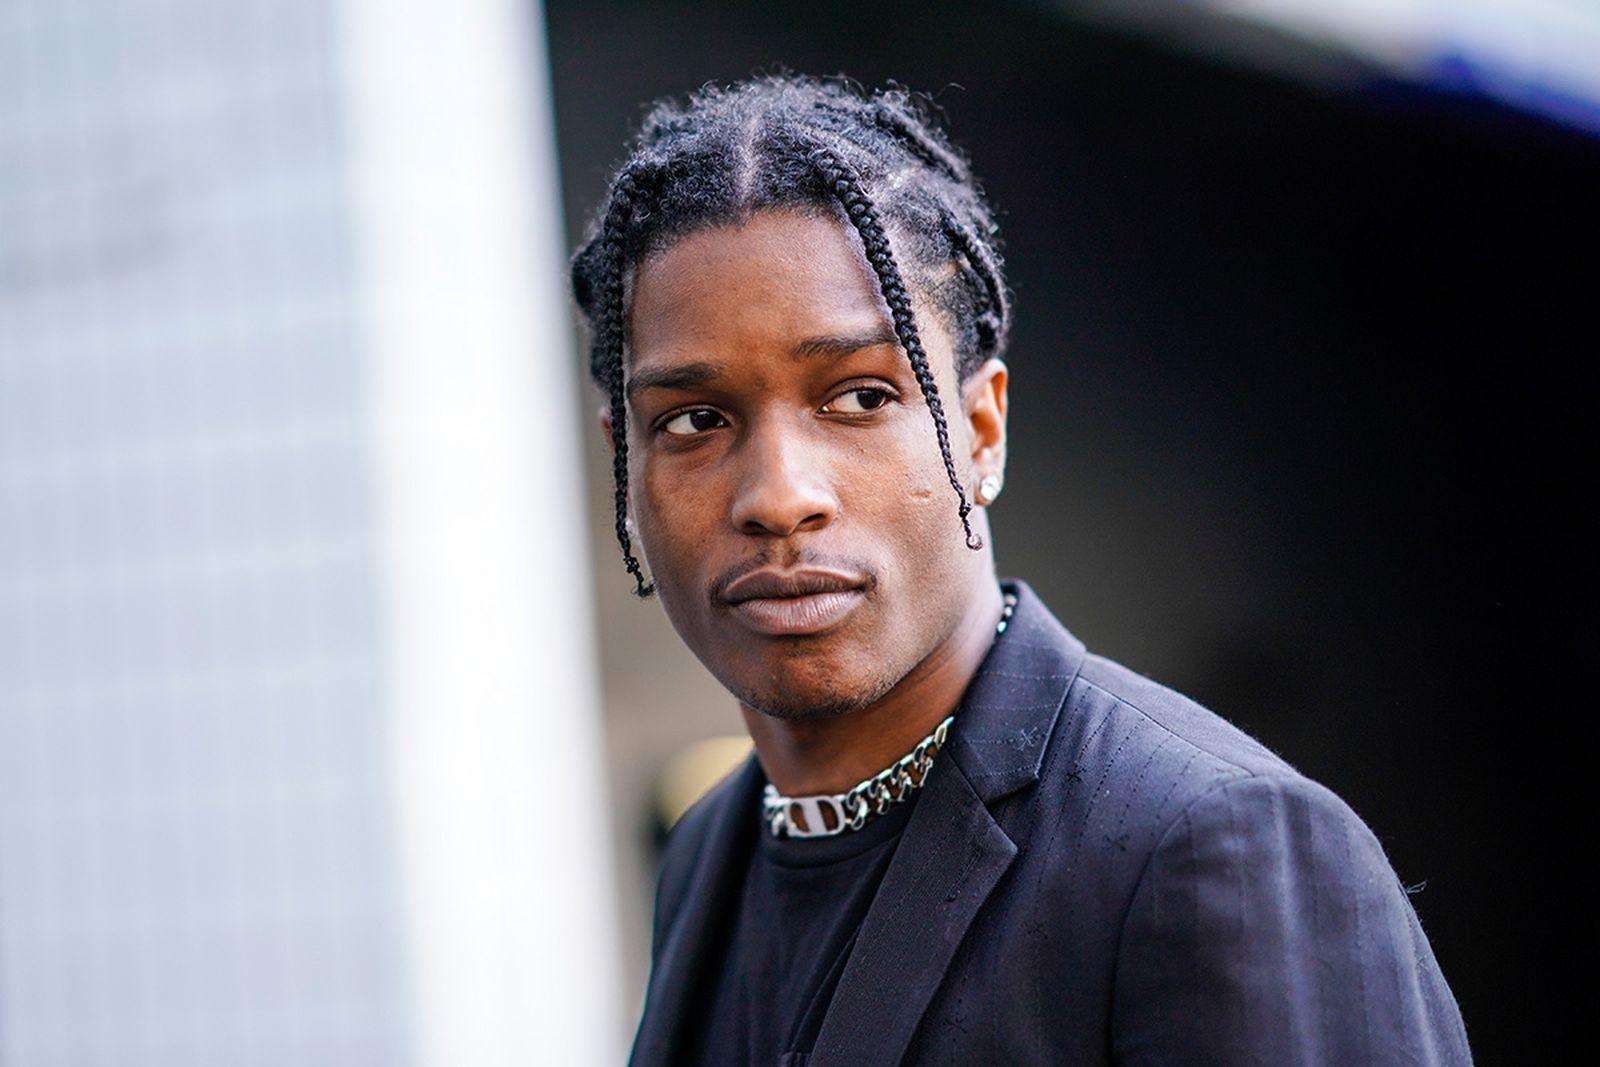 ASAP Rocky outside of 1017 ALYX 9SM's show at Paris Fashion Week